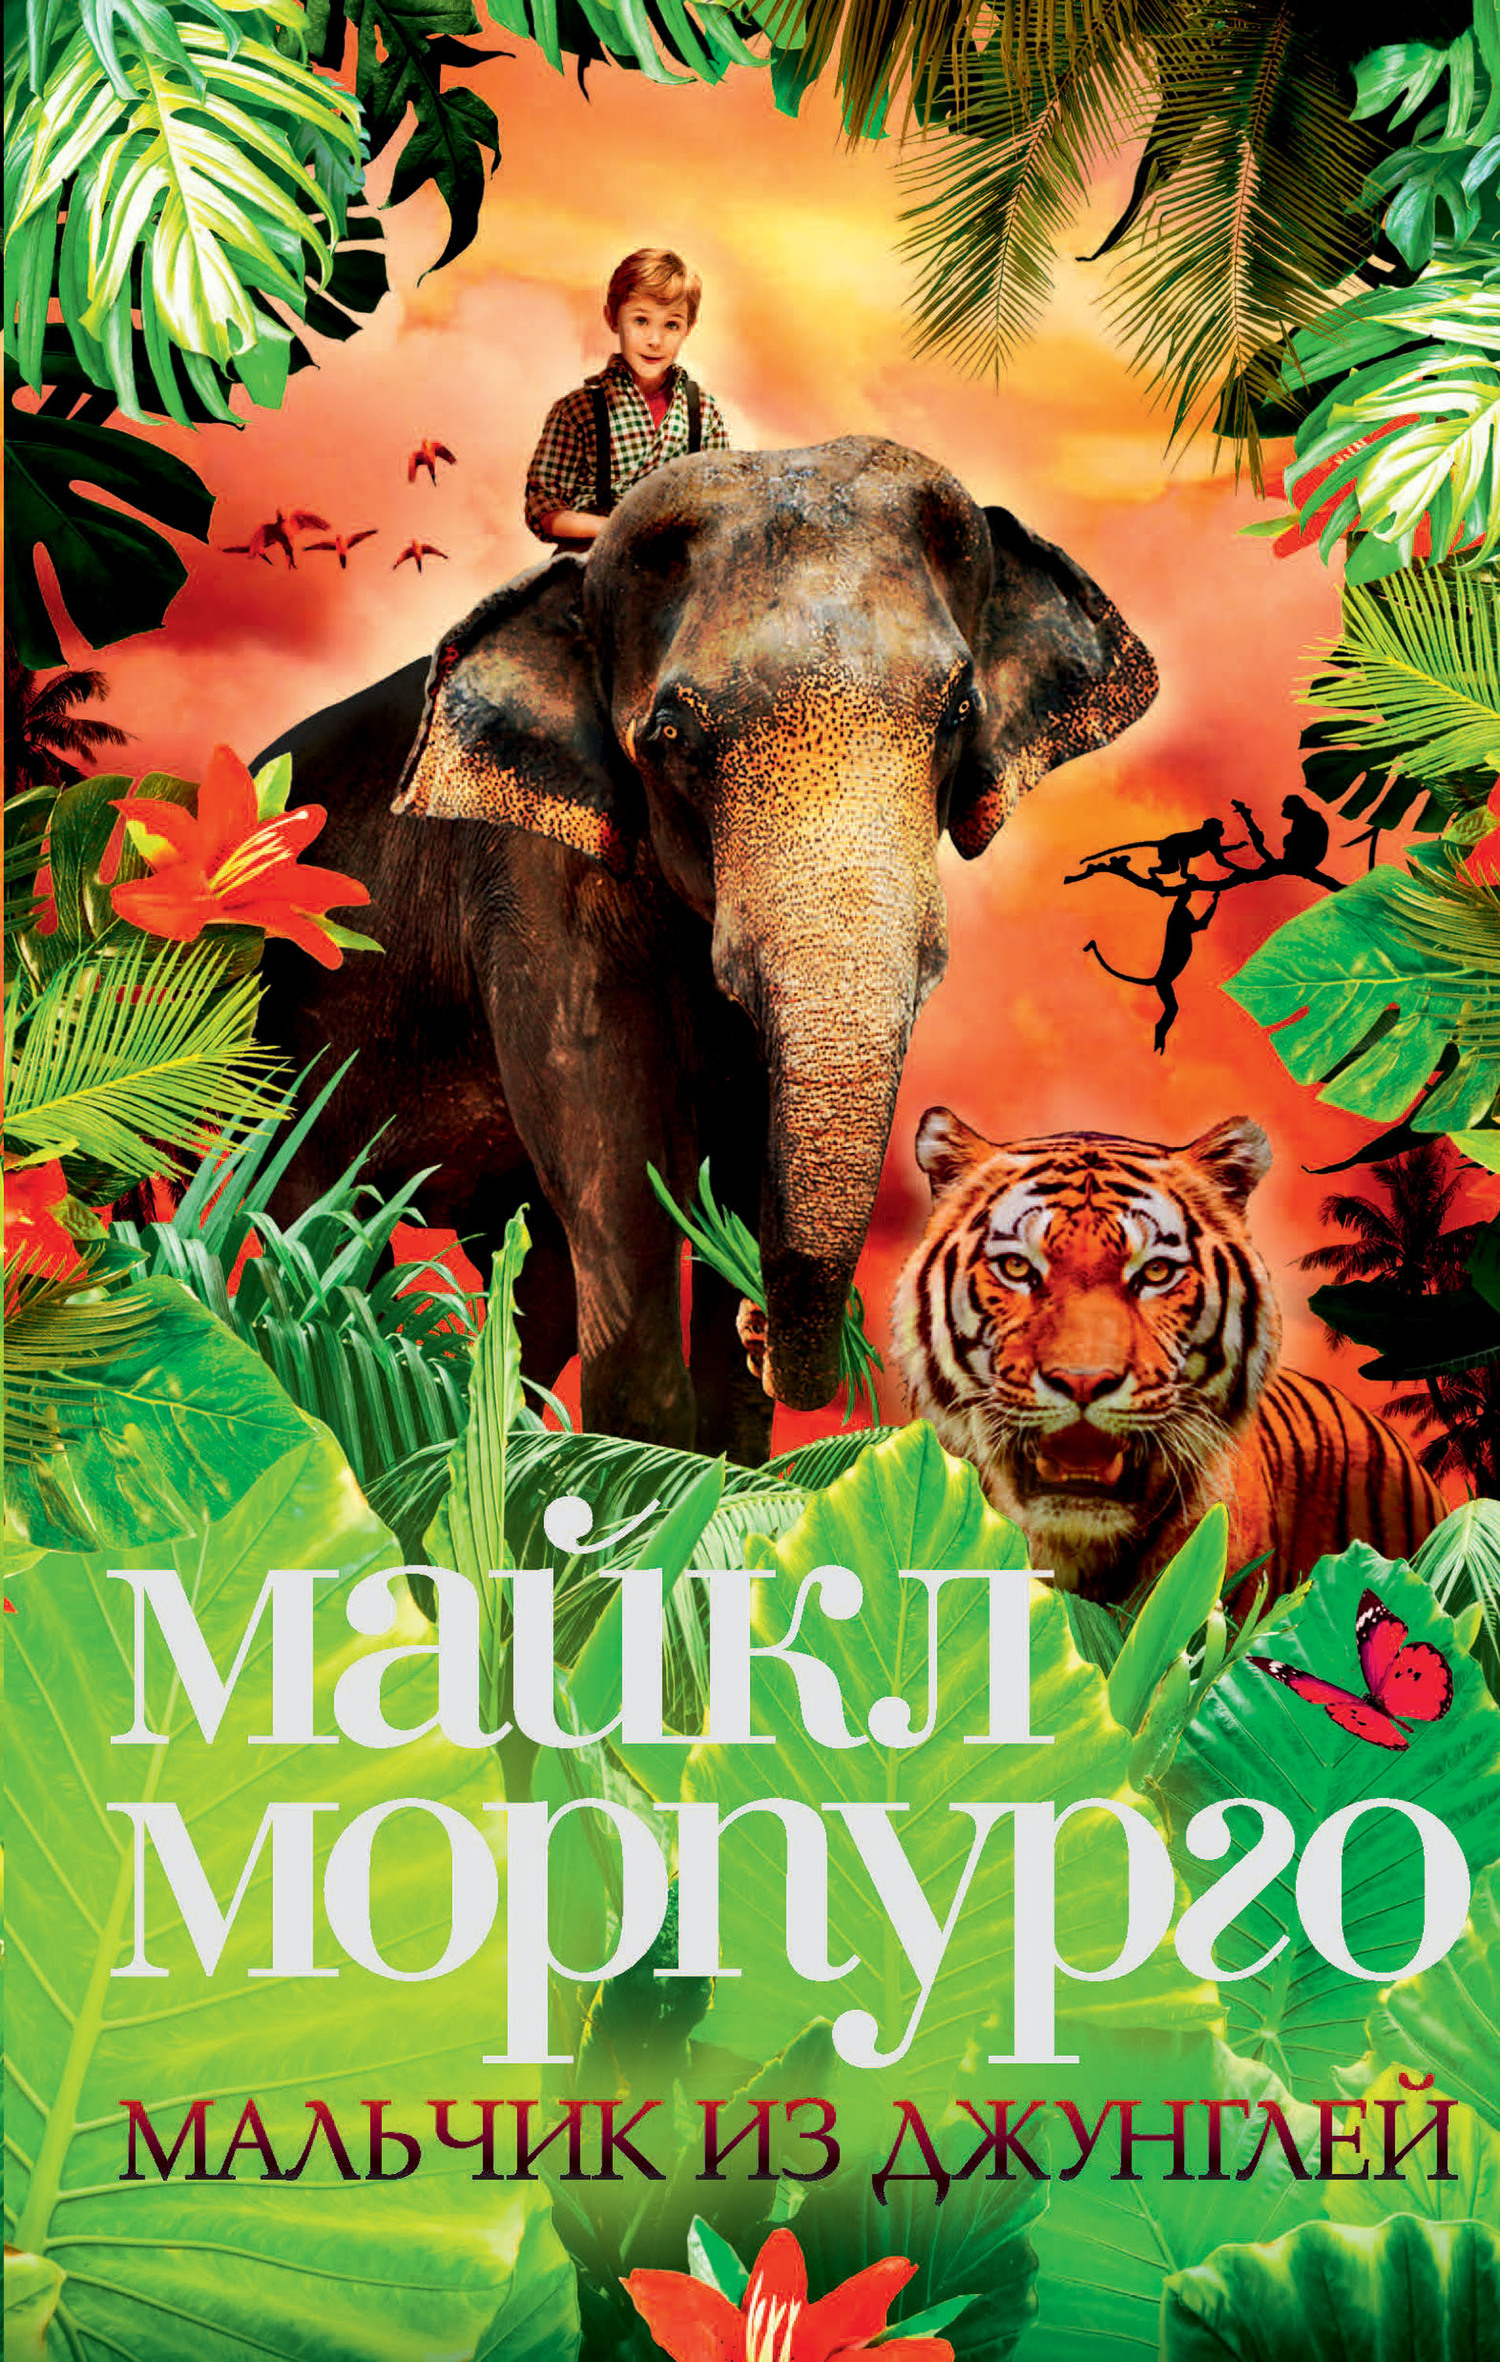 Майкл Морпурго - Мальчик из джунглей